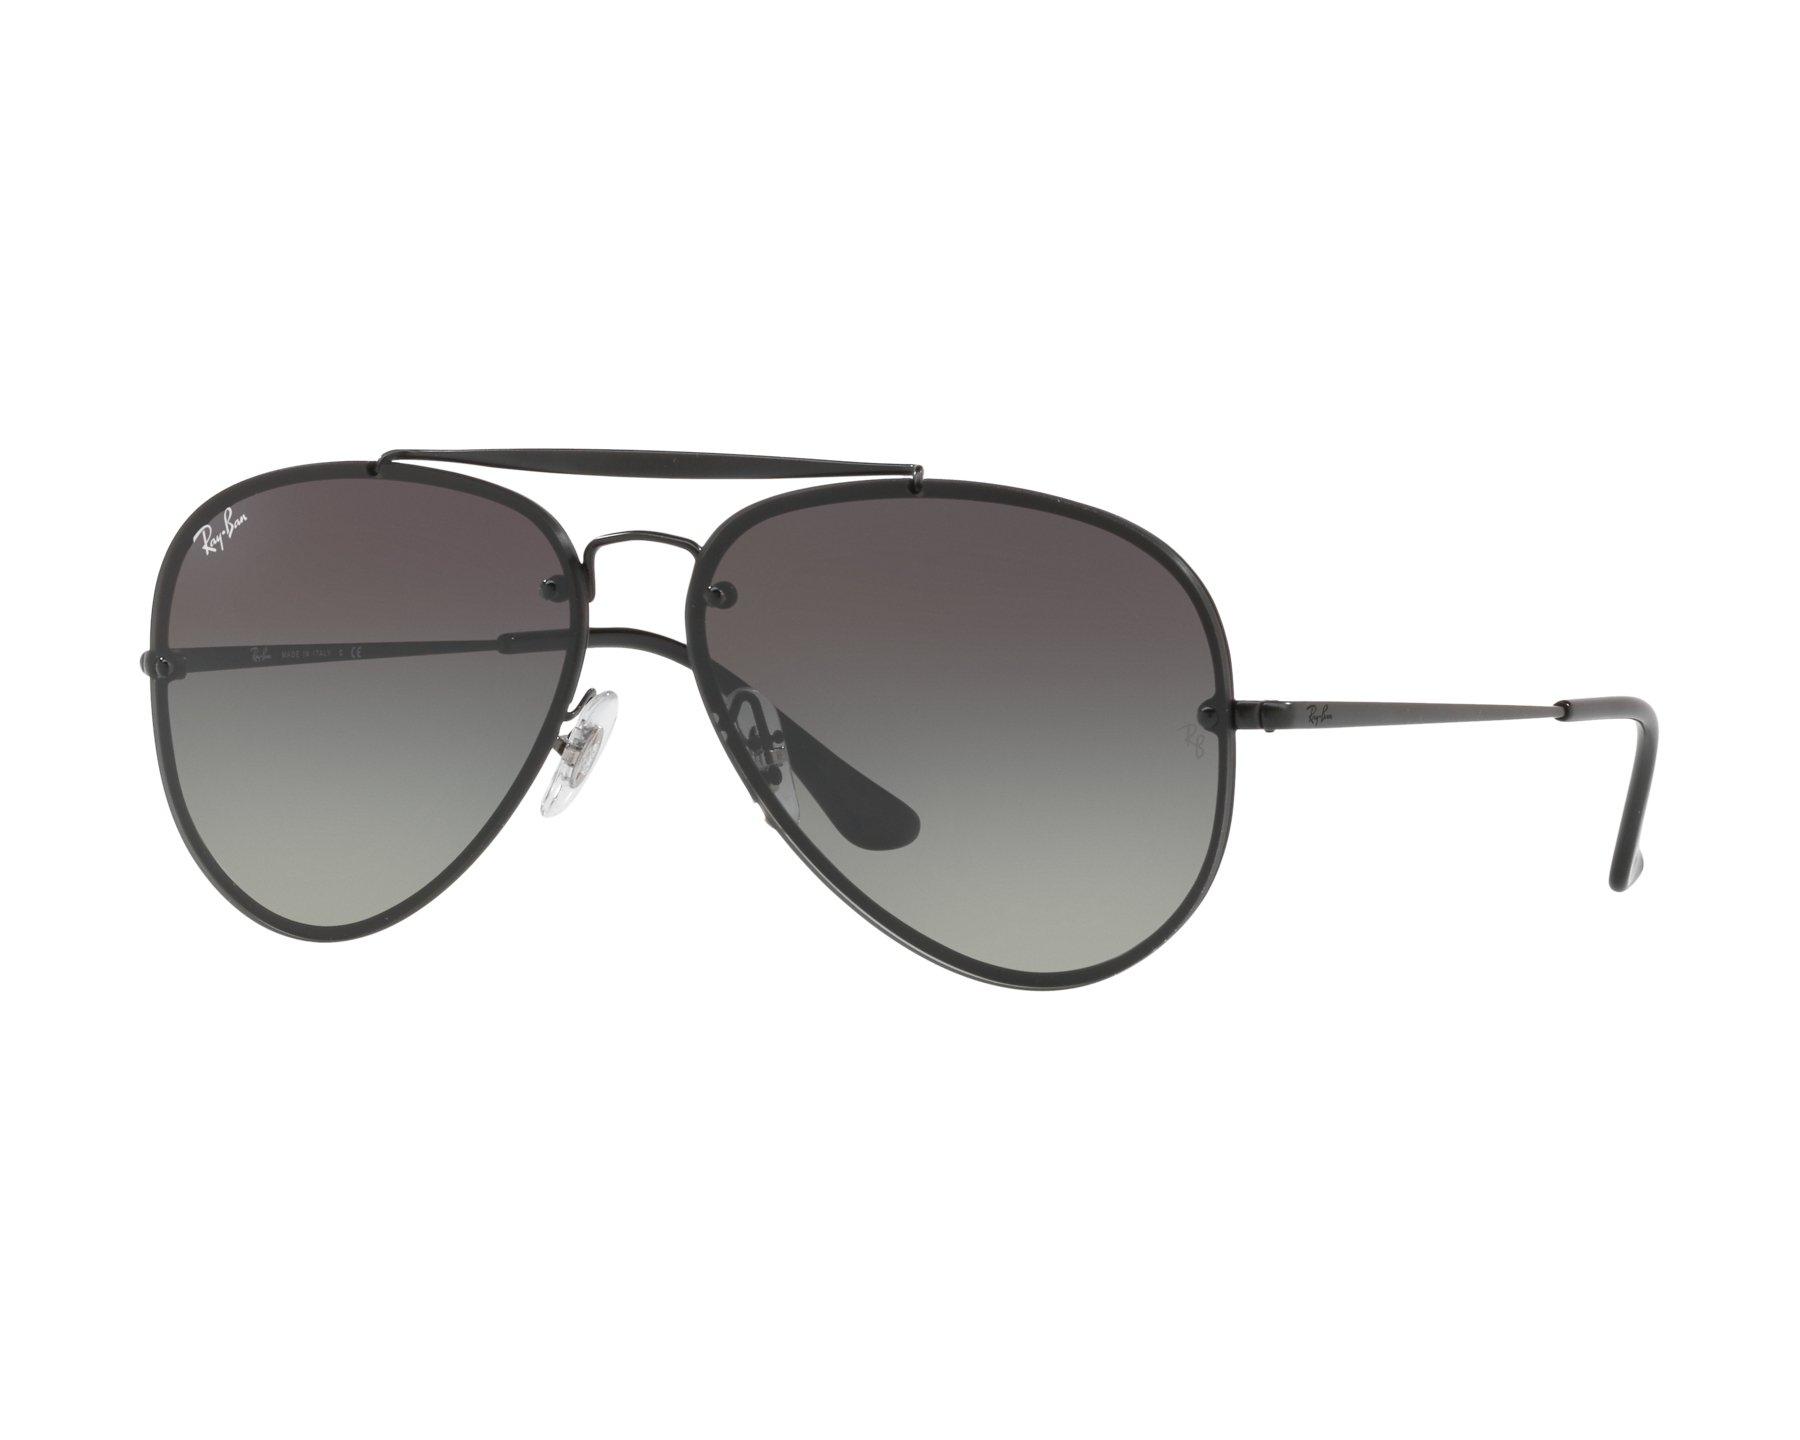 ray ban sonnenbrille rb 3584 n 153 11 jetzt online. Black Bedroom Furniture Sets. Home Design Ideas